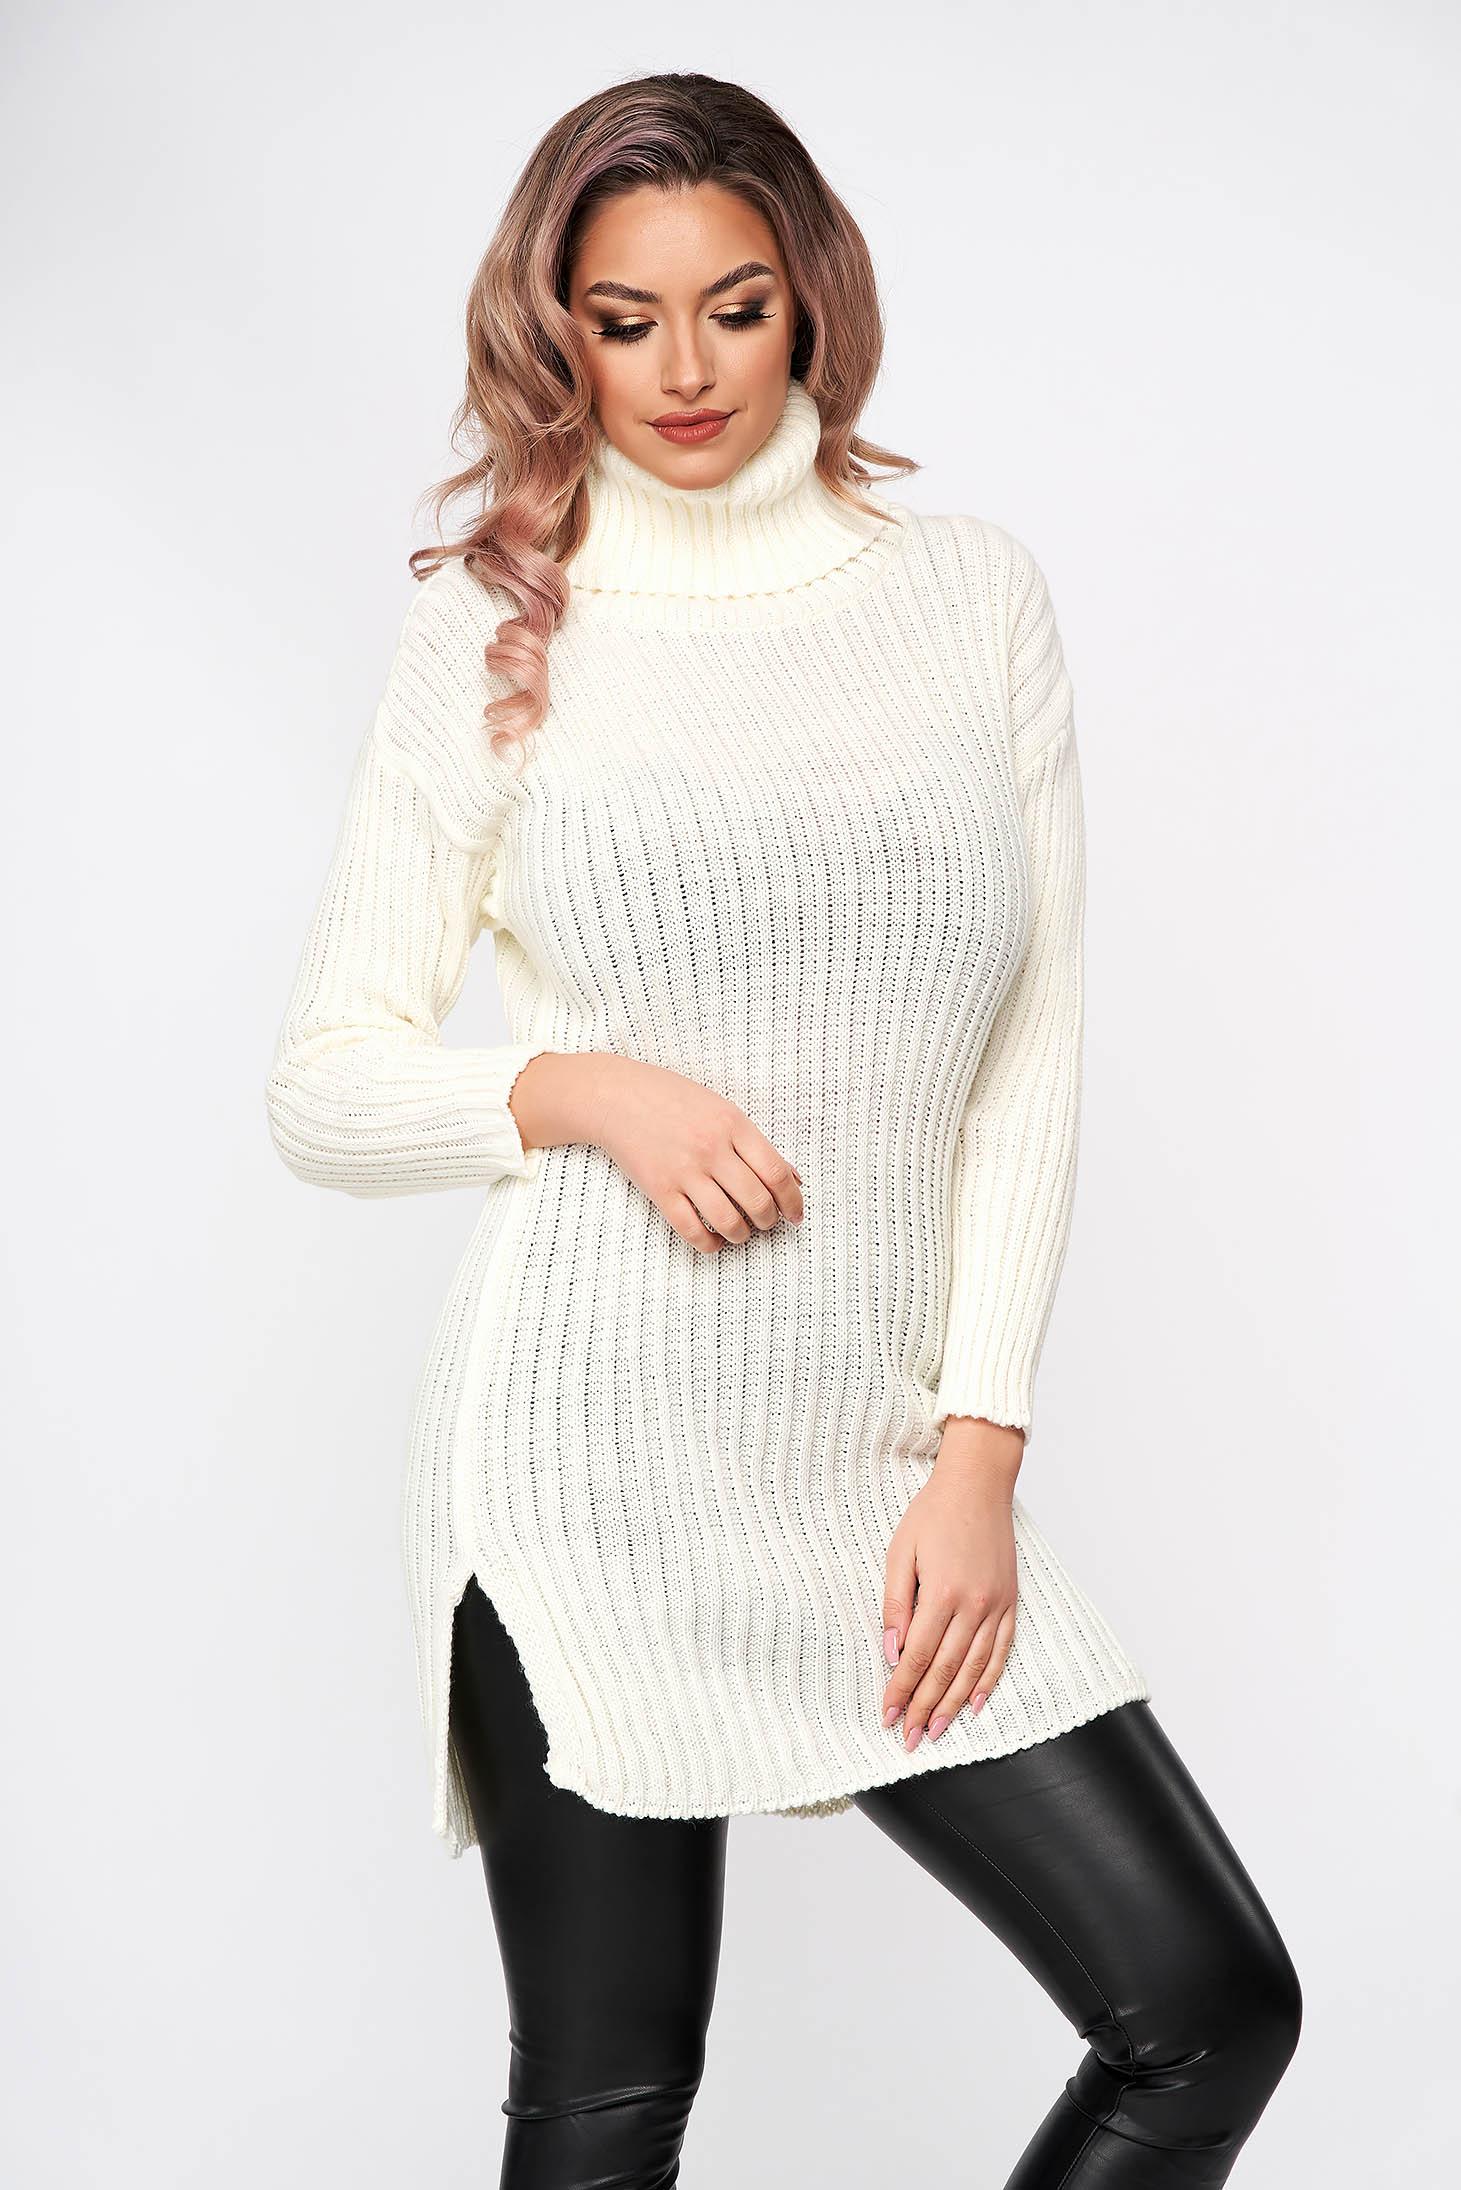 Rochie SunShine alba din tricot elastic reiat midi pe gat cu croi larg